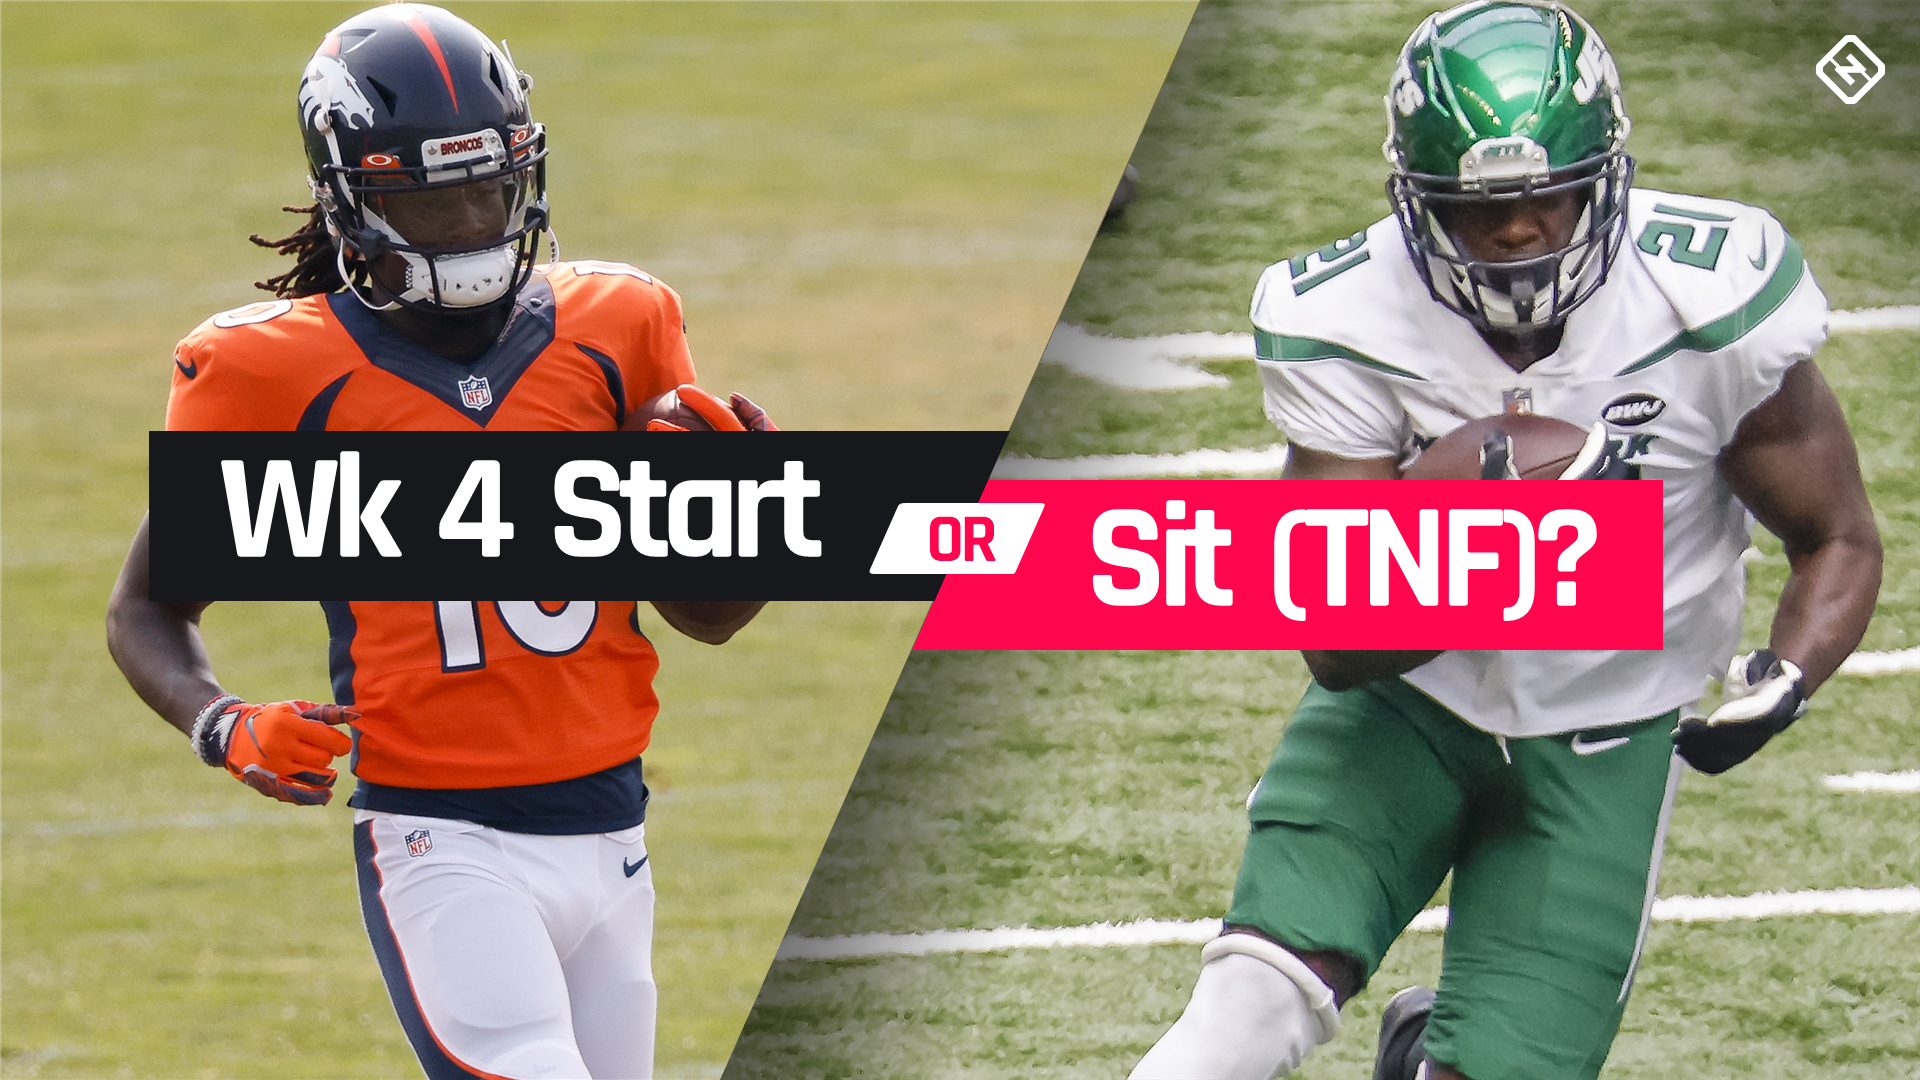 Broncos Vs Jets Fantasy Football Start Em Sit Em For Week 4 Thursday Night Football Worldnewsera